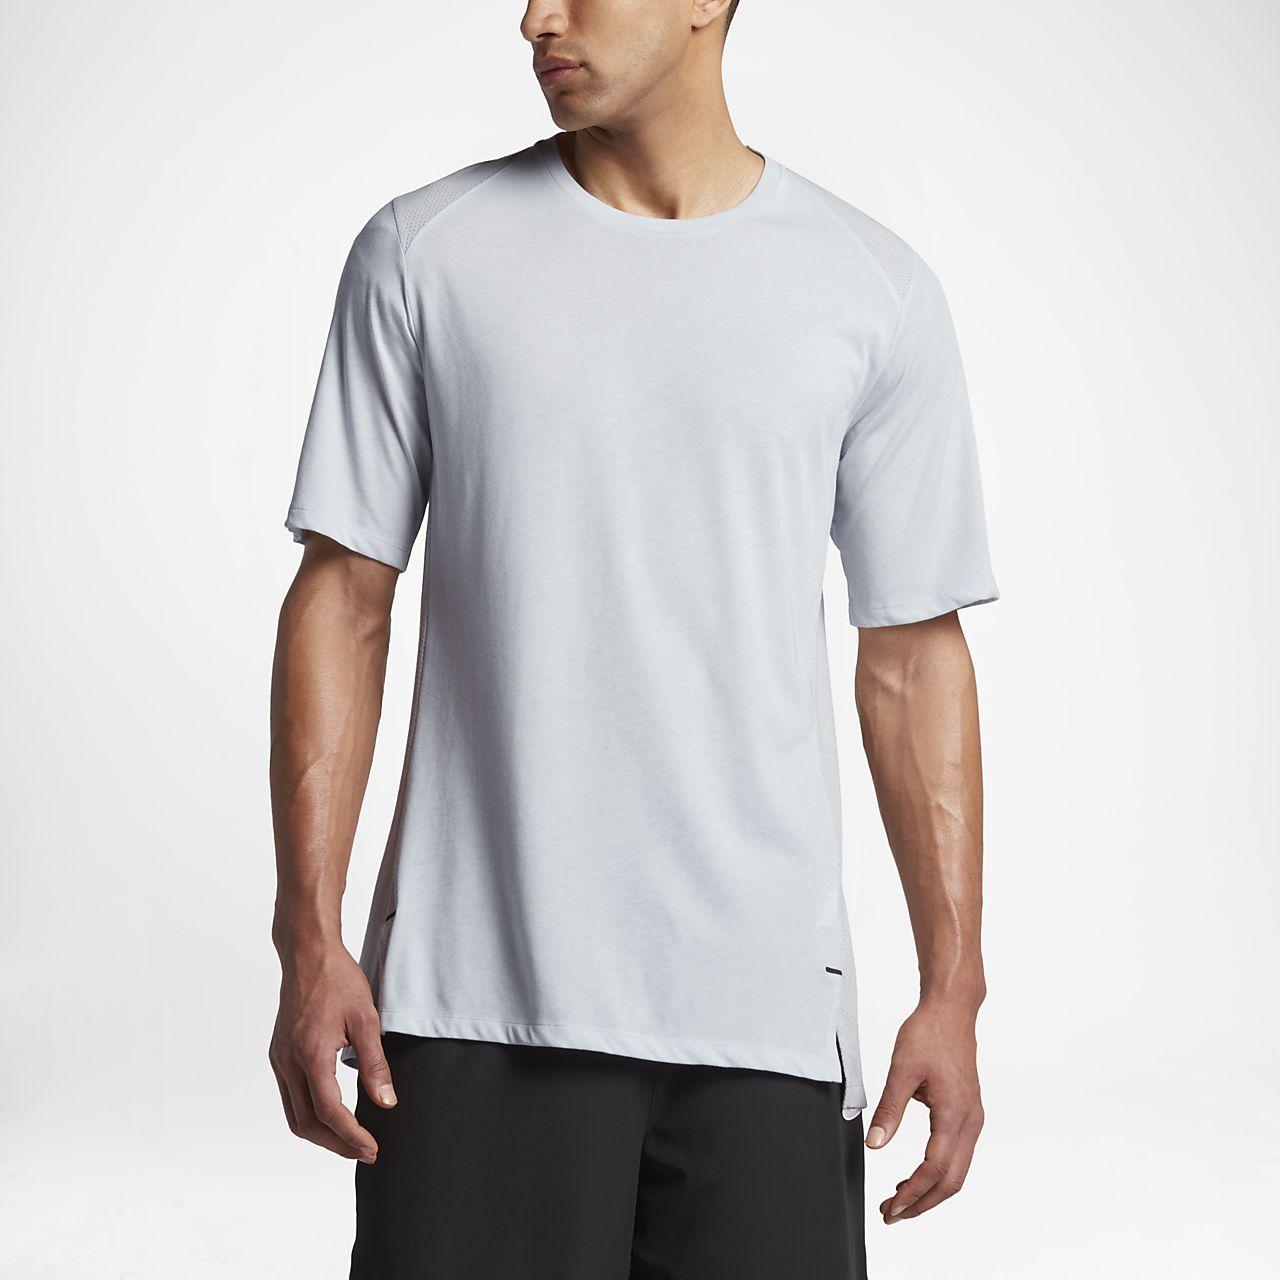 4230e601c48d Nike Elite Men s Short-Sleeve Basketball Top. Nike.com CA